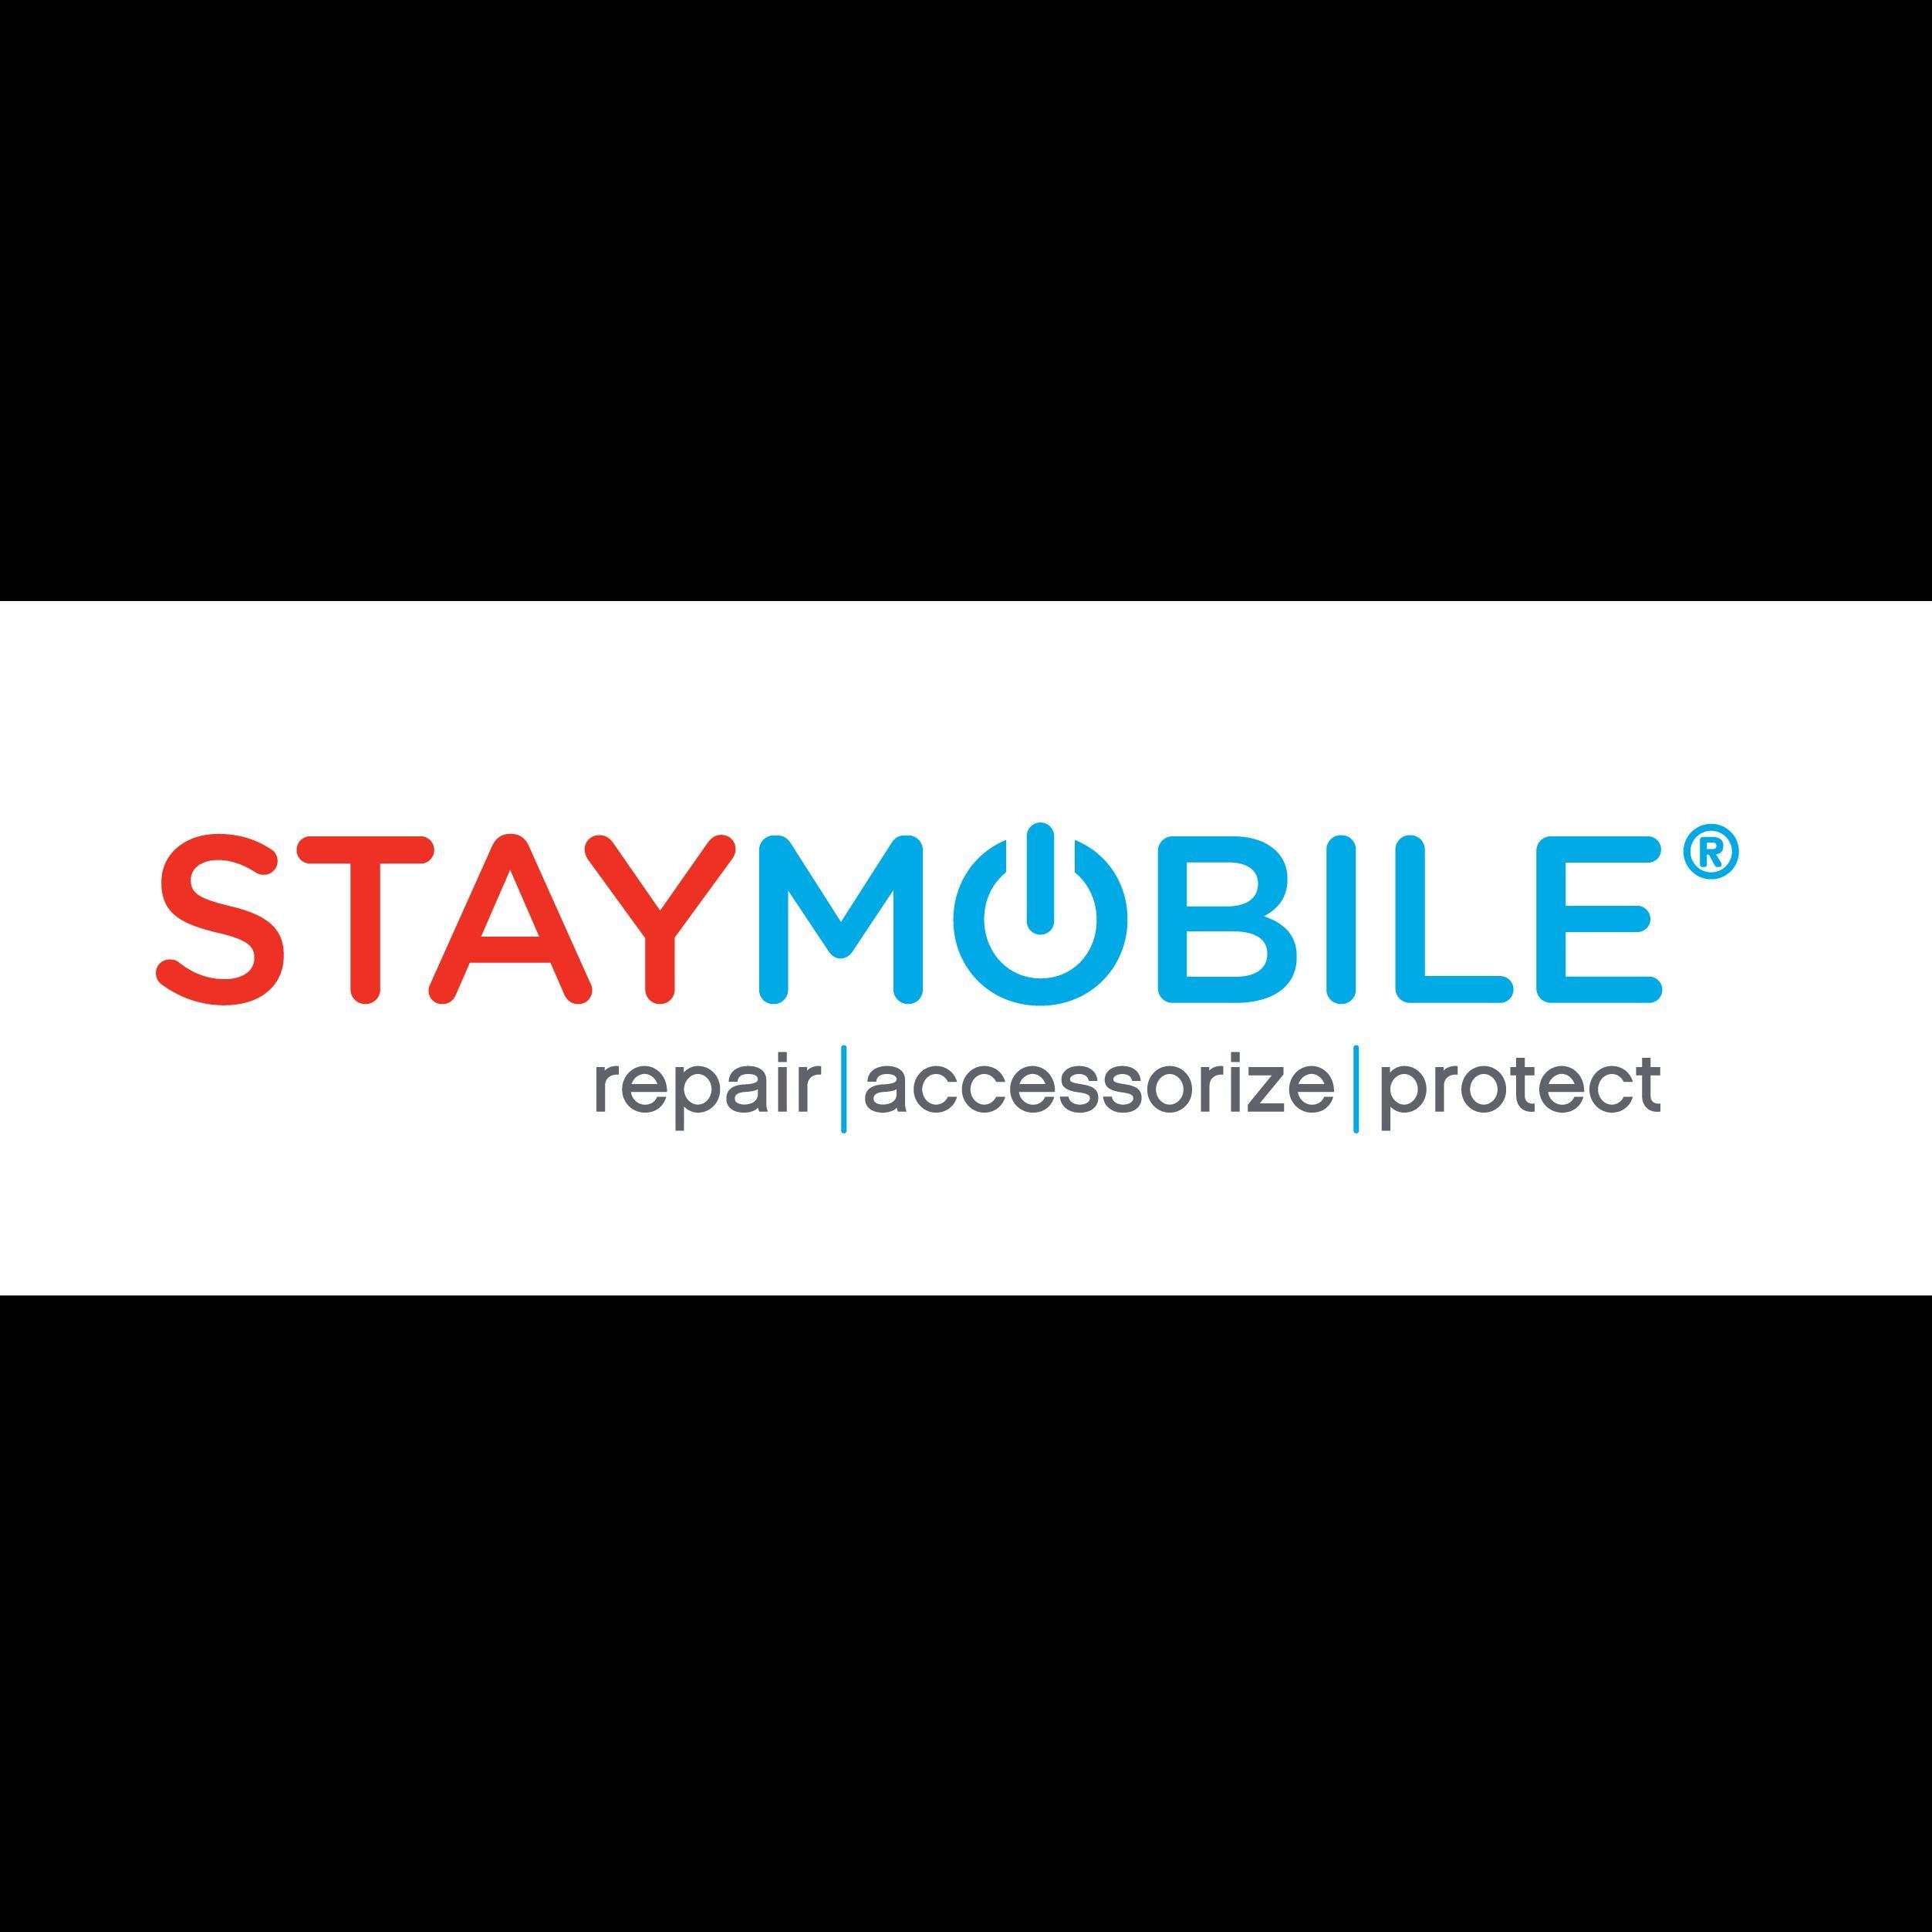 Staymobile